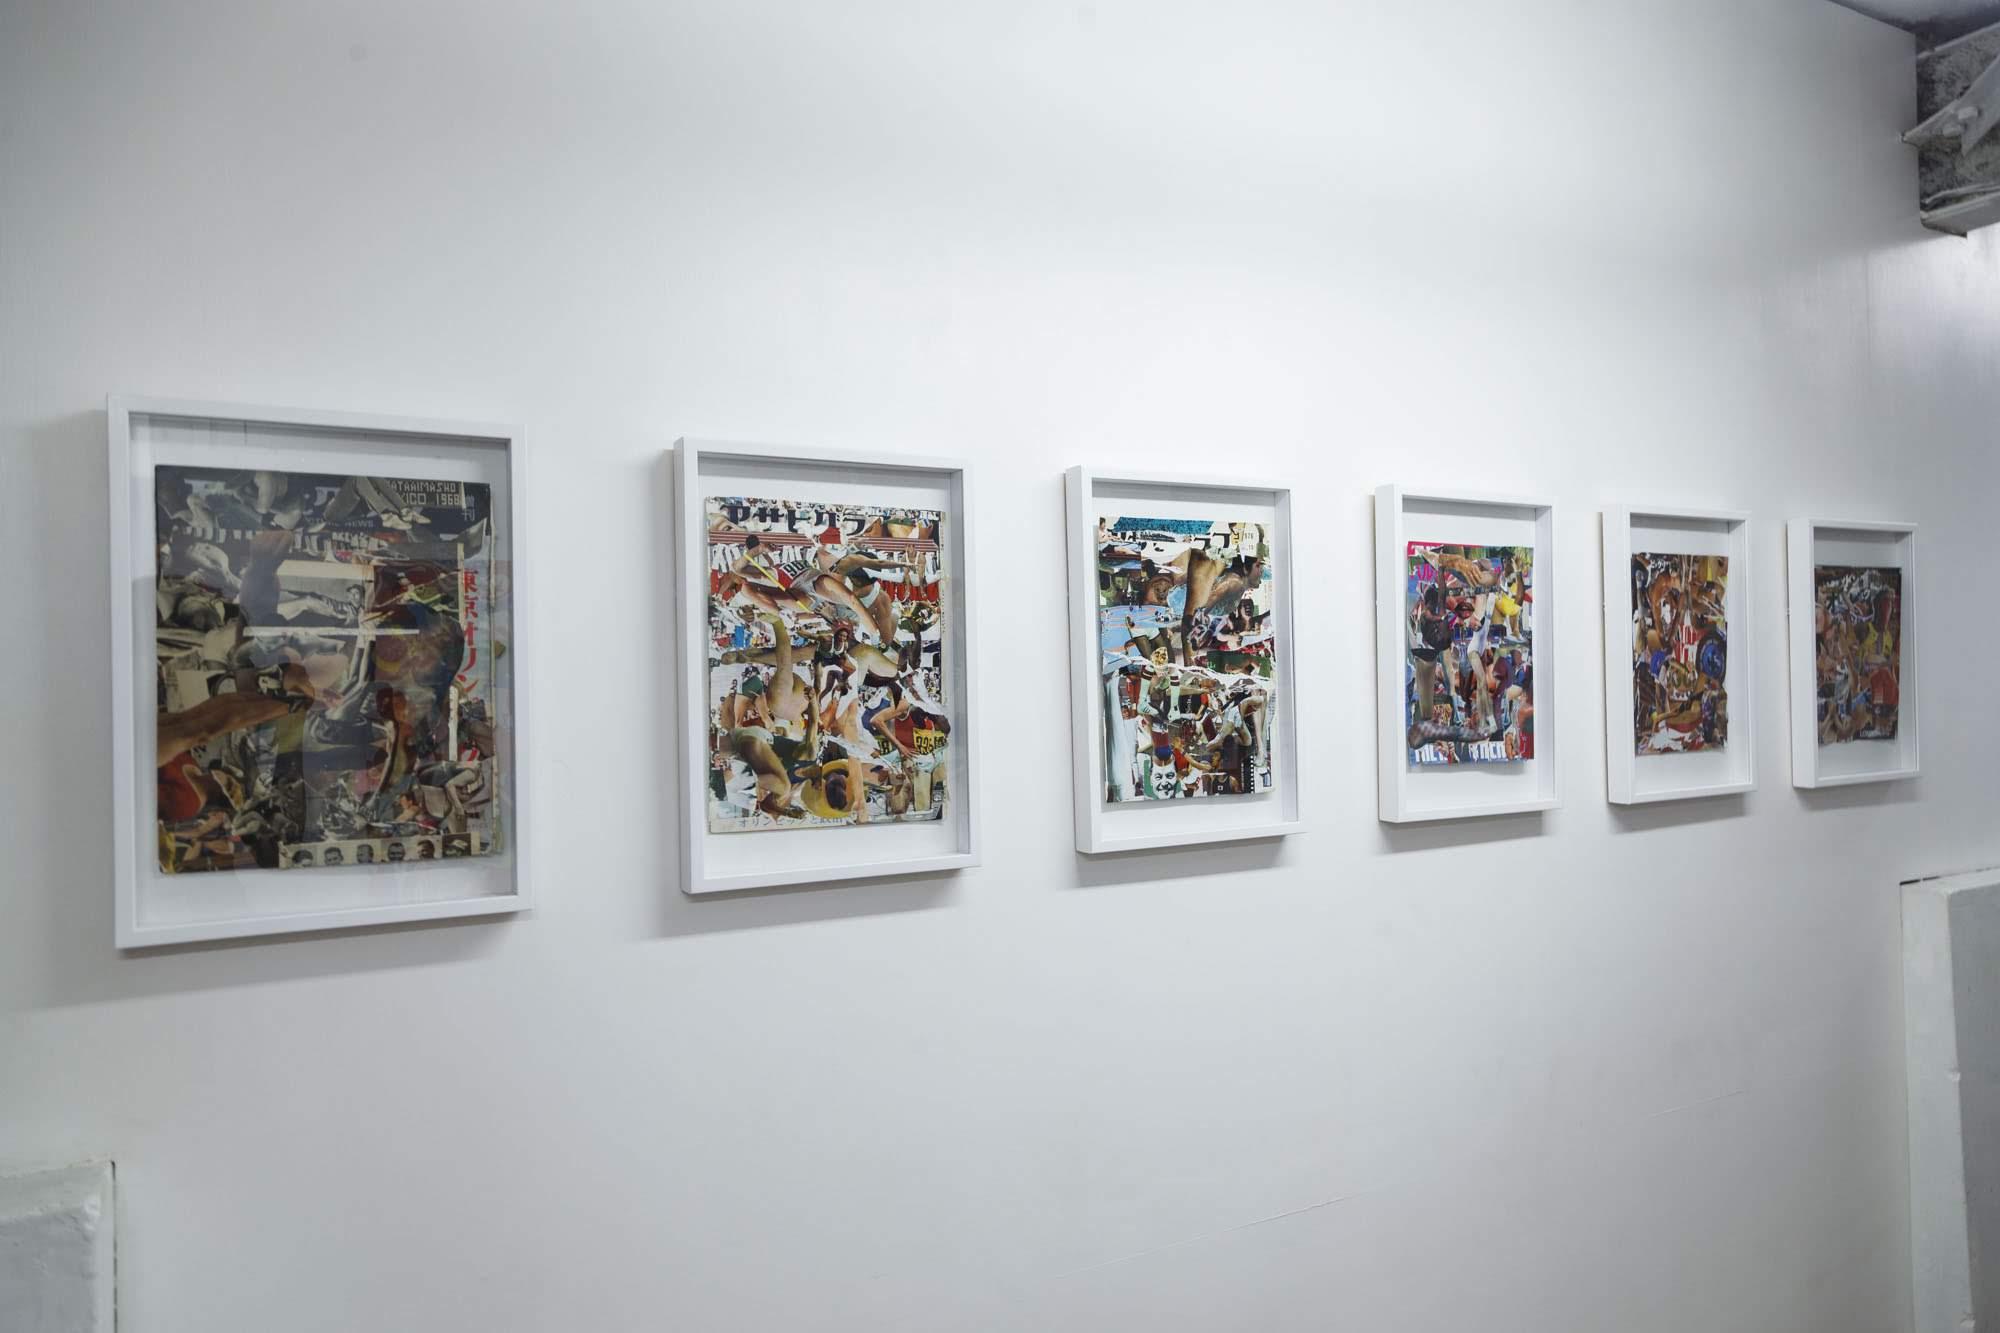 《highlight -栄光のスクラップアンドビルド-》series, 立岩有美子, Magazine of collage, 297×233mm, 2018